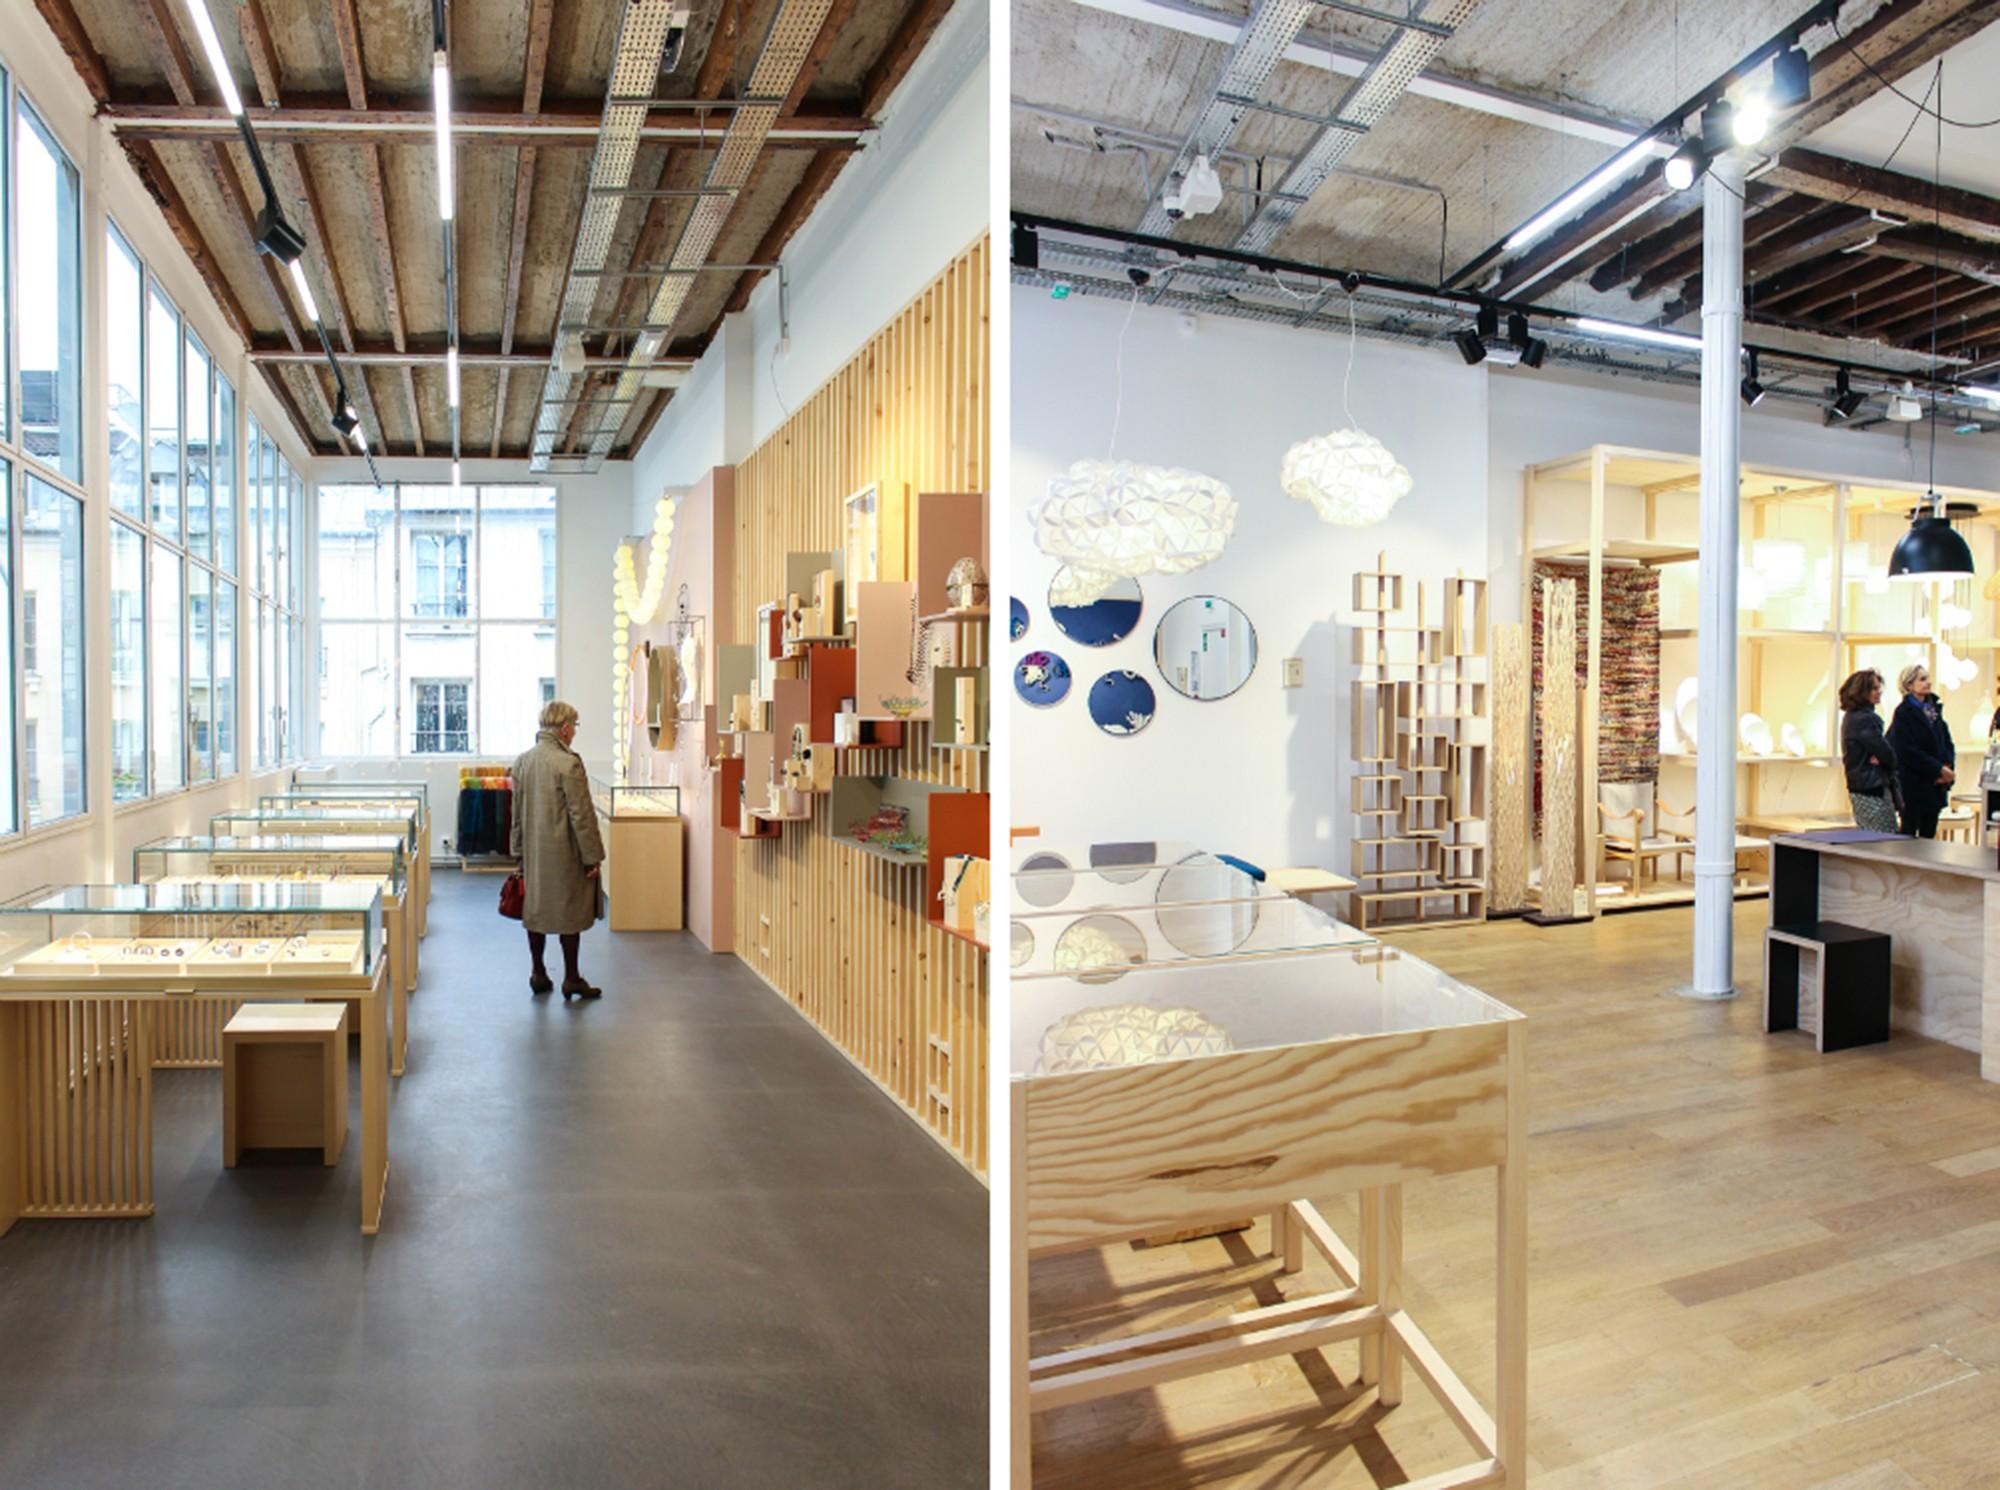 Empreintes Concept Store in the Haut Marais Paris